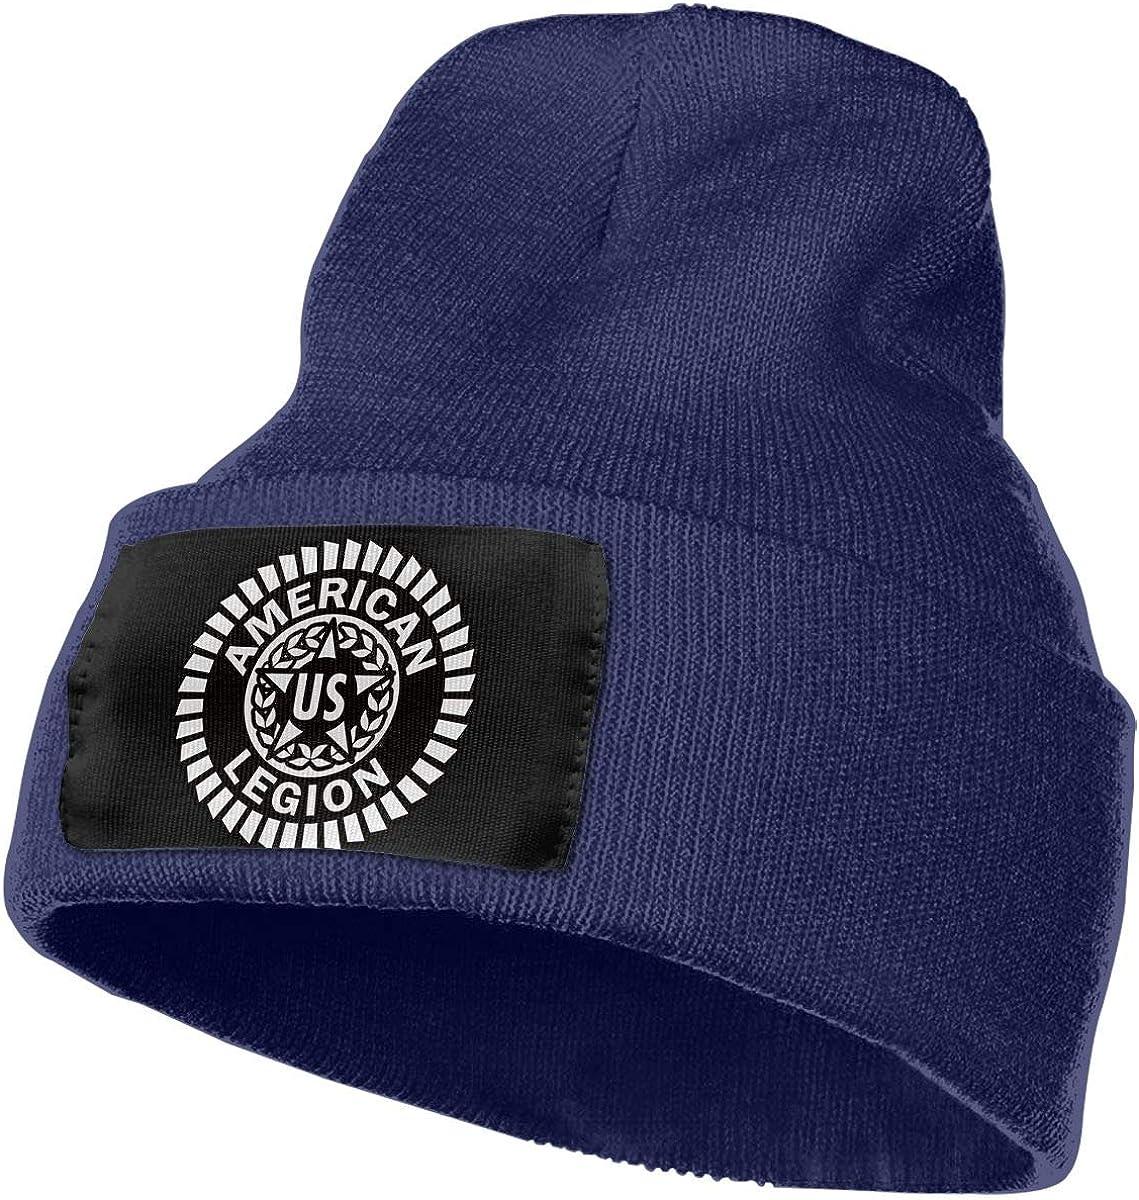 SLADDD1 US American Legion Trend Printing Warm Winter Hat Knit Beanie Skull Cap Cuff Beanie Hat Winter Hats for Men /& Women